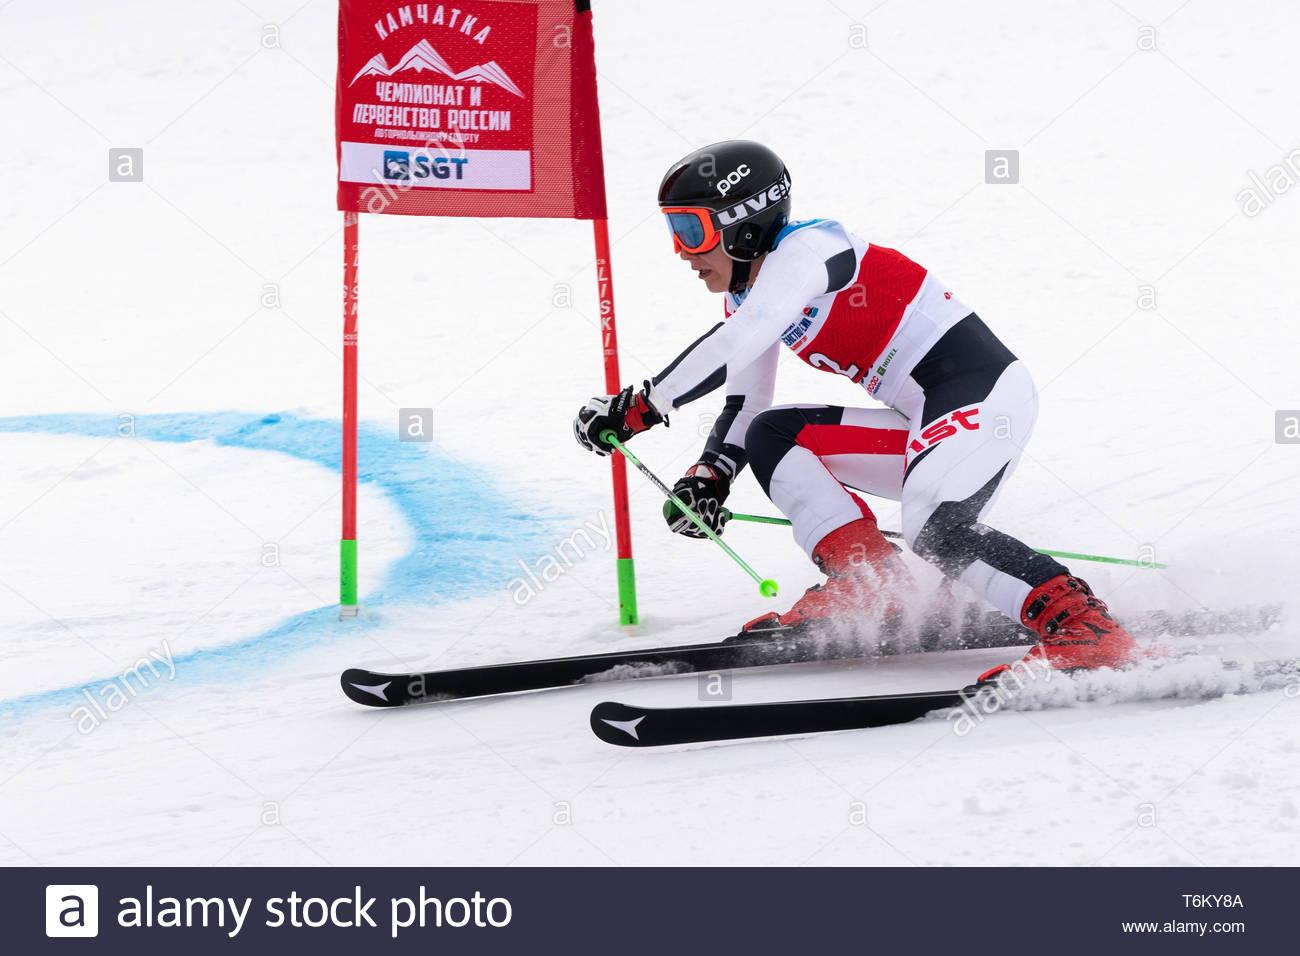 KAMCHATKA, RUSSIA - APR 2, 2019: Russian Women's Alpine Skiing Cup, International Ski Federation Championship, giant slalom. Mountain skier Timchenko  - Stock Image